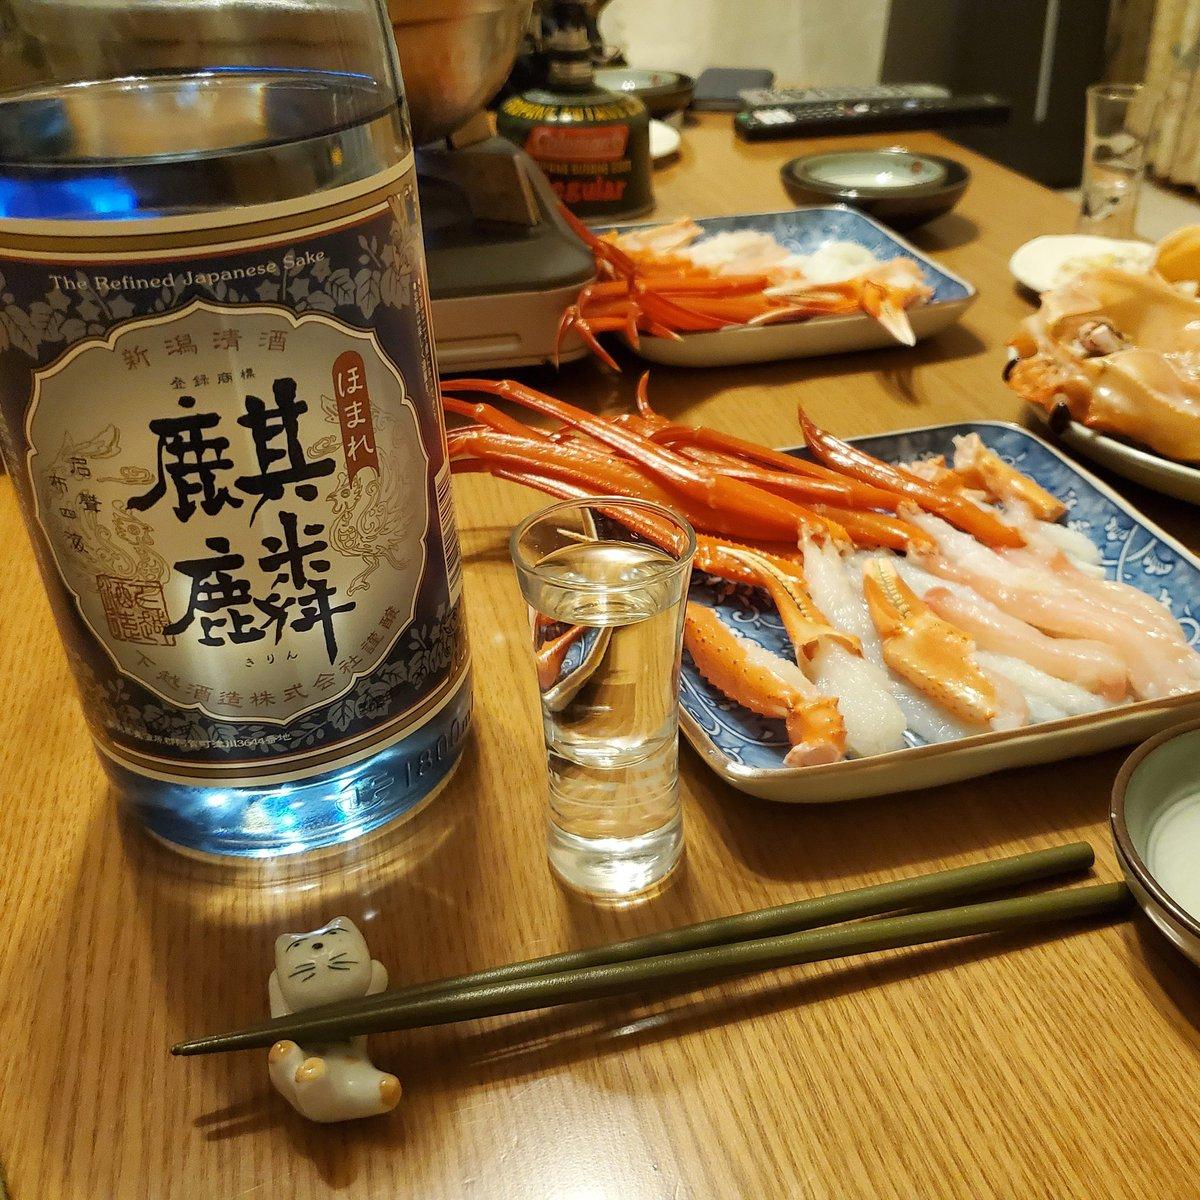 test ツイッターメディア - 遠くに住んでる家族が紅ズワイカニを送ってくれた😍カニ味噌の甲羅焼きもお酒との相性バッチリです。新潟の日本酒。下越酒造 ほまれ麒麟 特別純米 https://t.co/vcSPJTBvwg